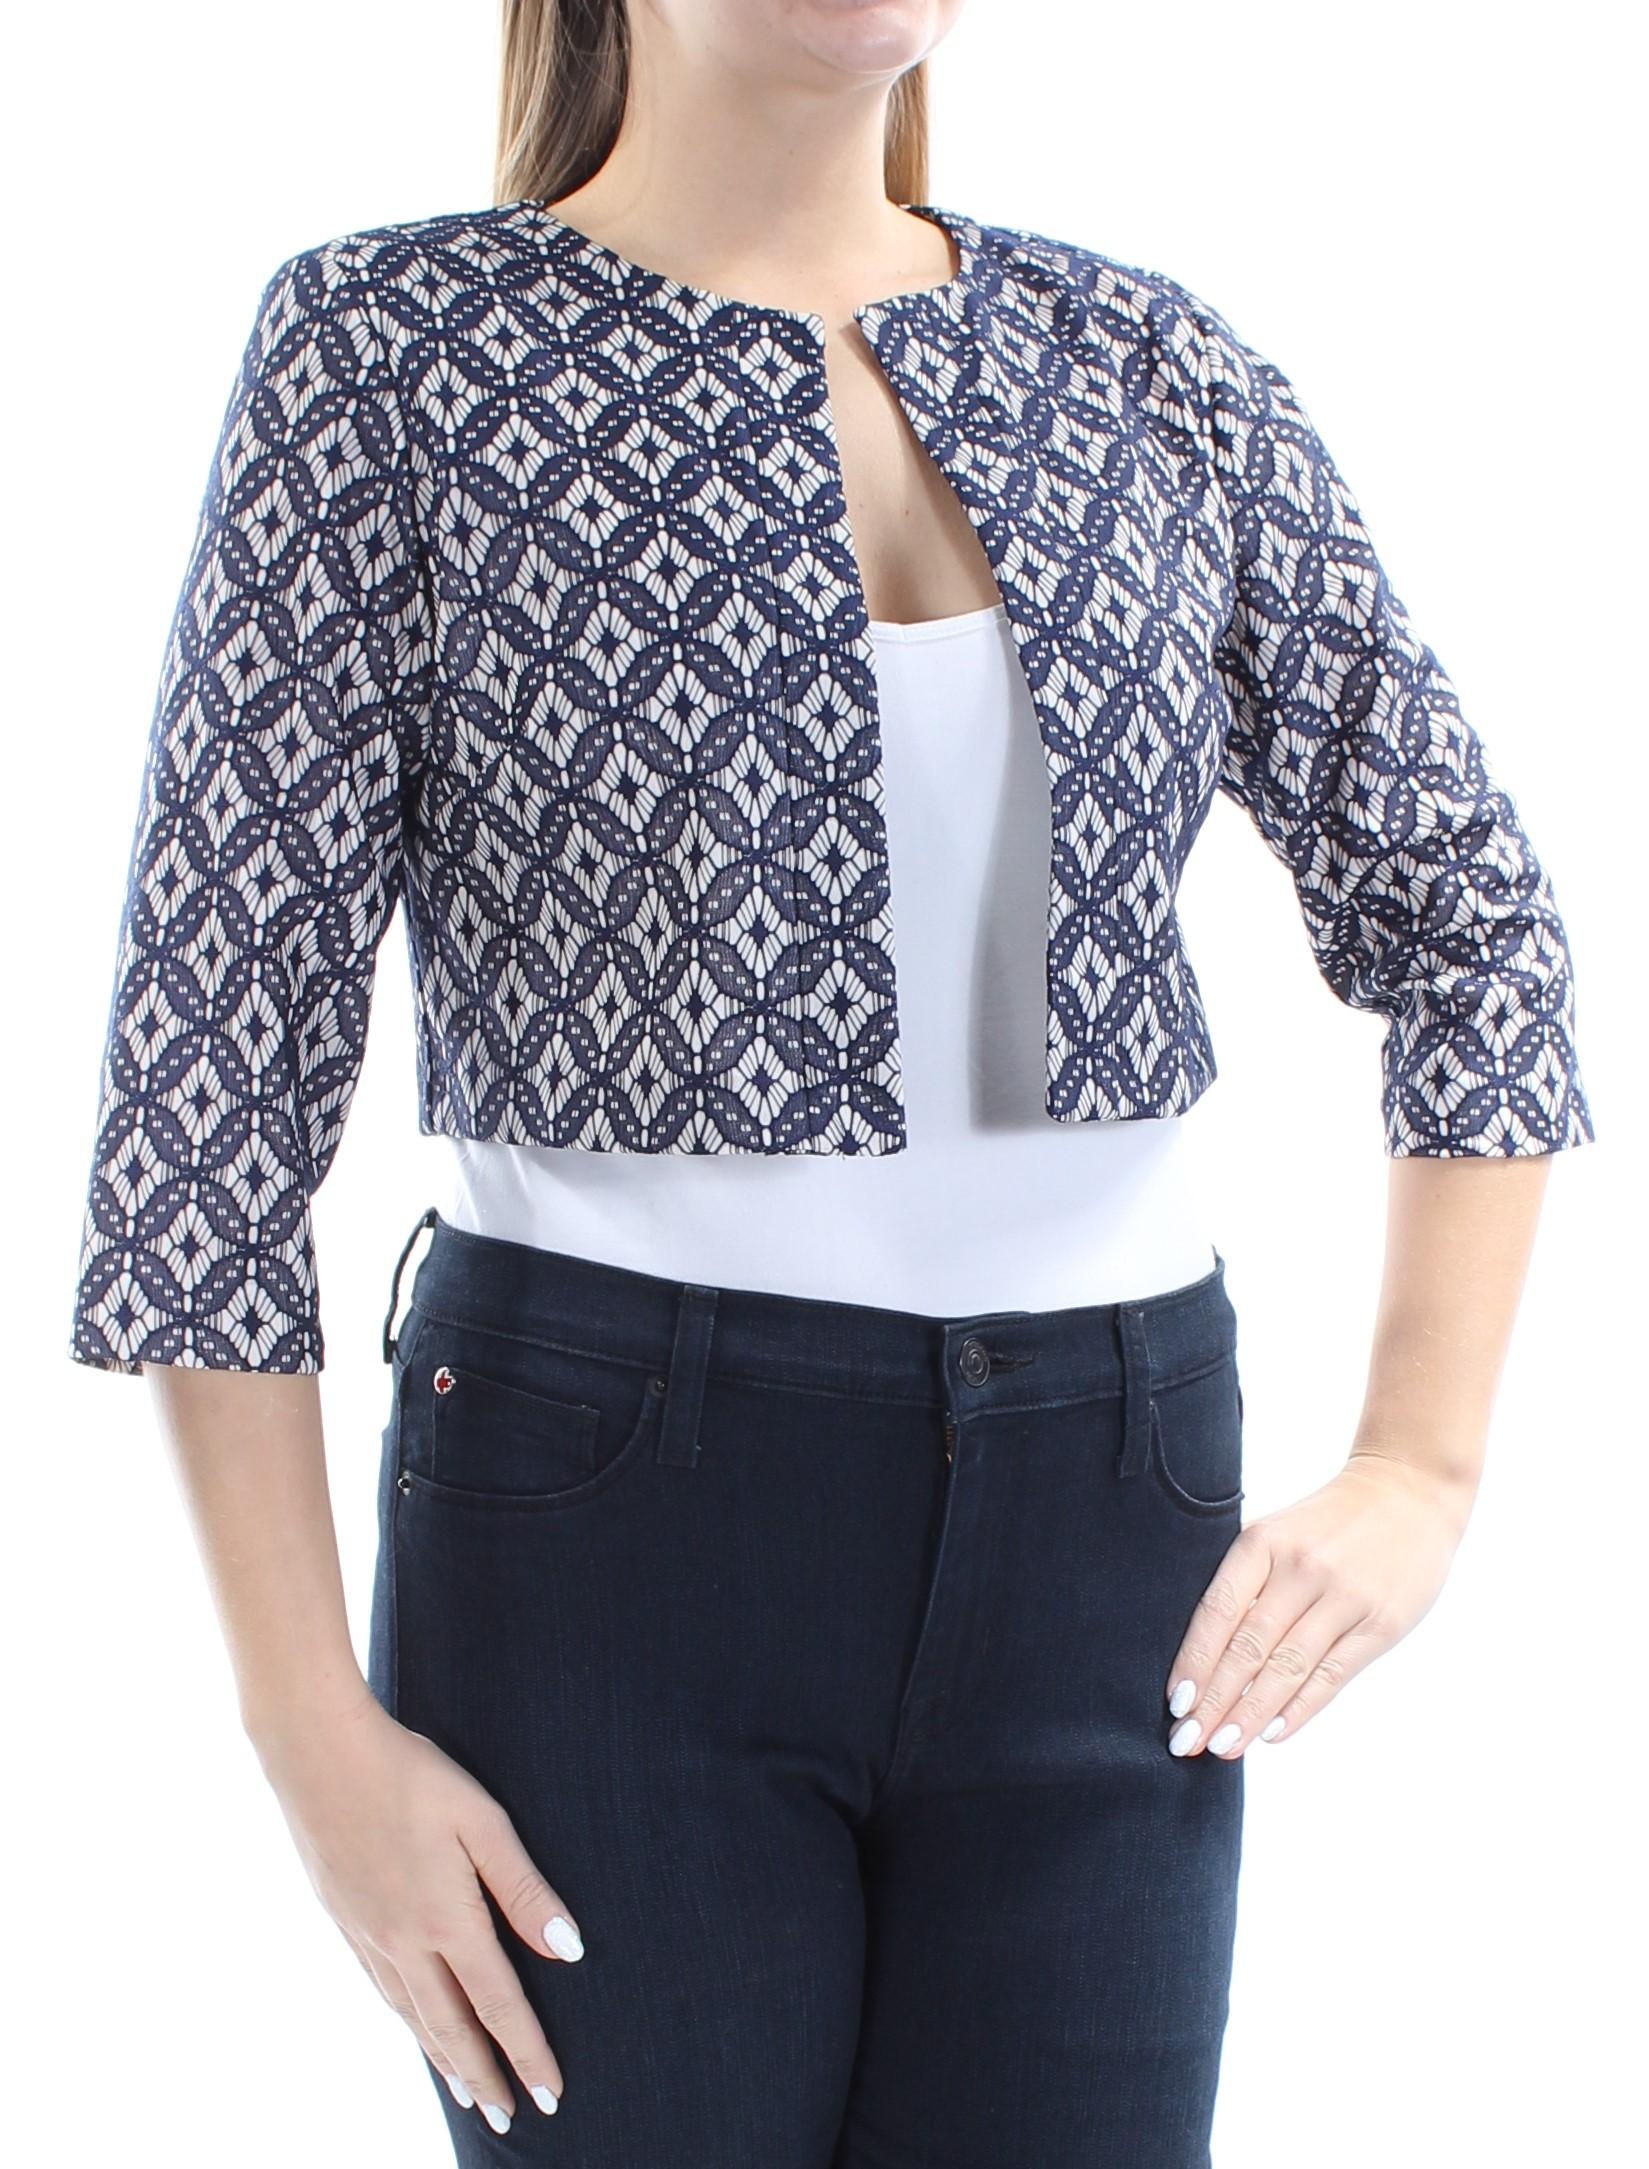 JESSICA HOWARD Womens Navy Beige Lace Geometric Bolero Wear To Work Jacket Petites  Size: 10